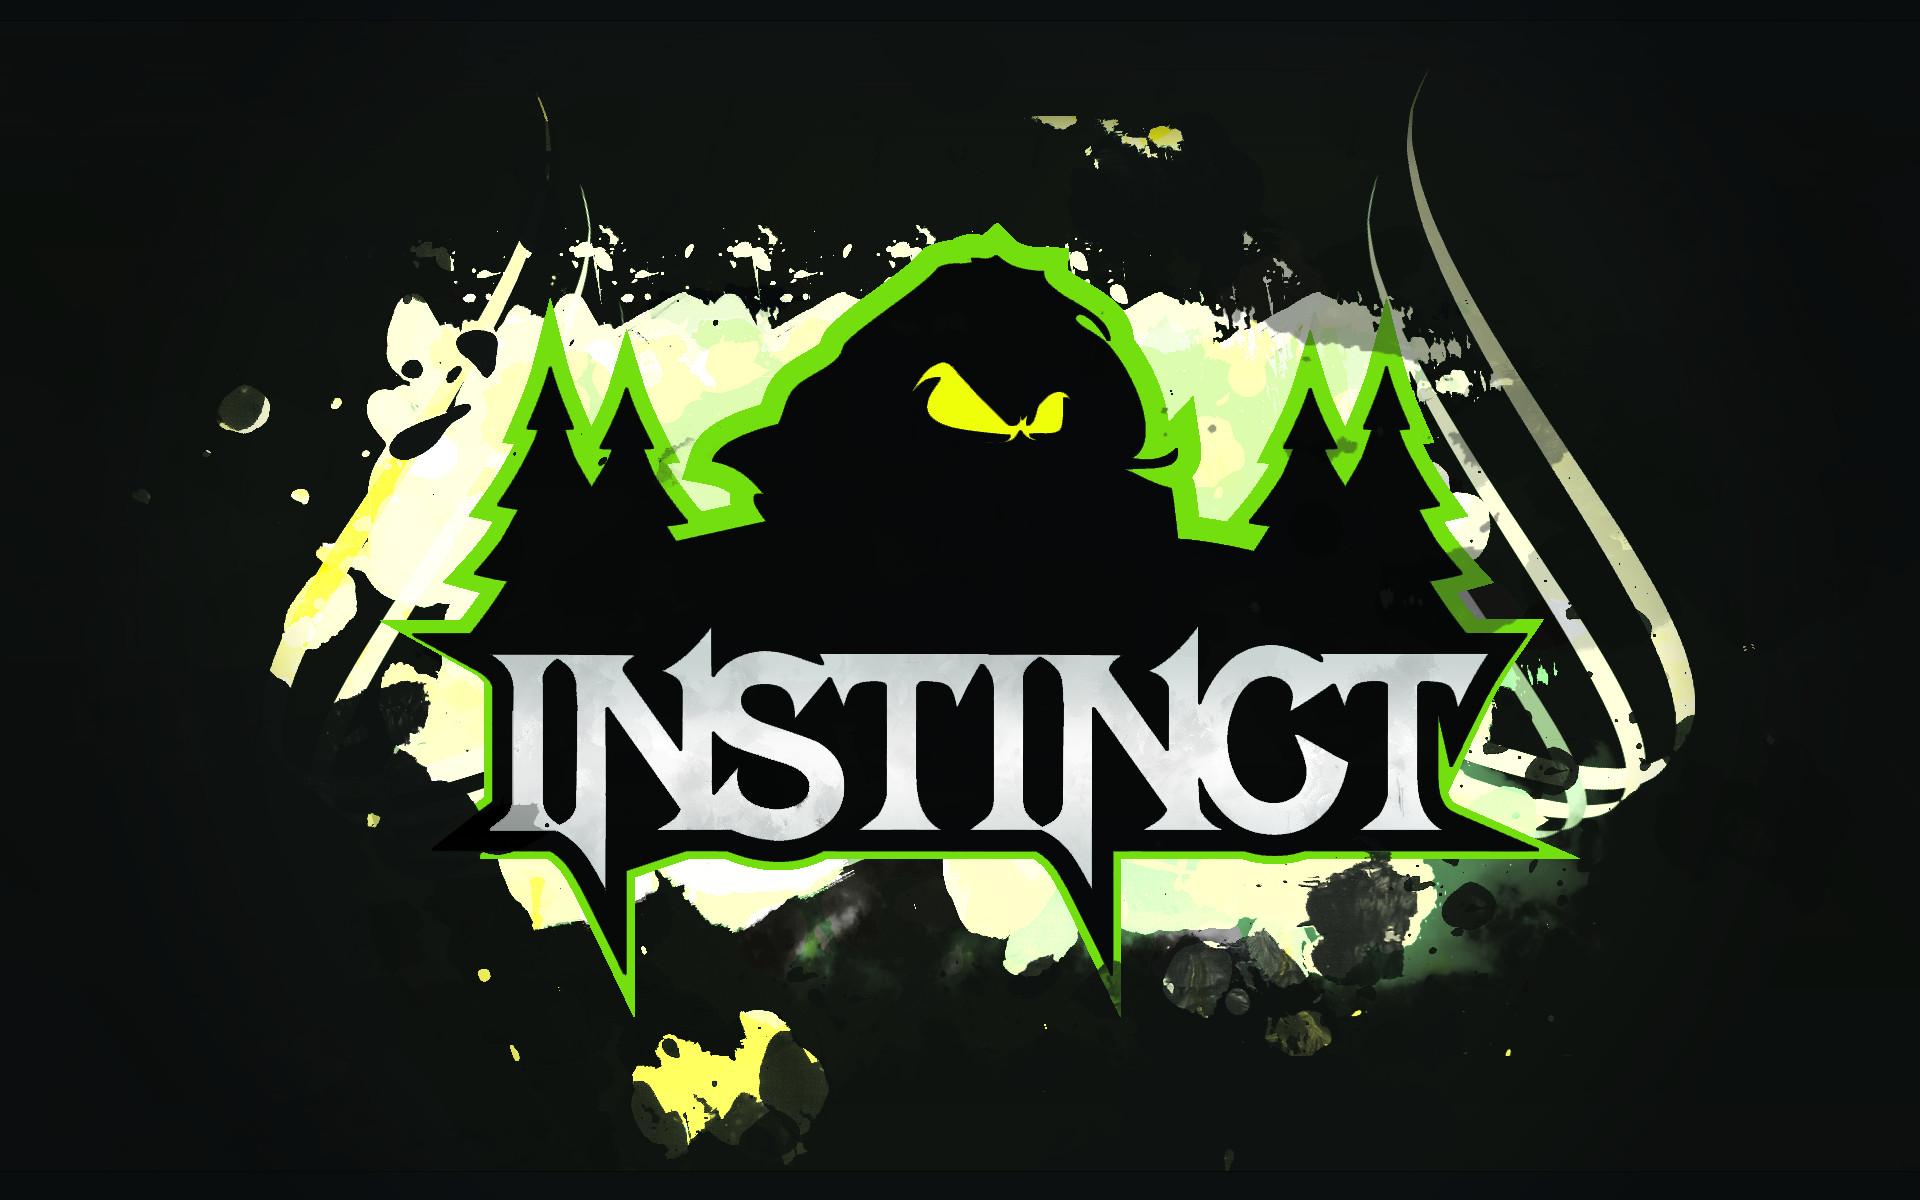 Mlg Team Logos Mlg Team Logos